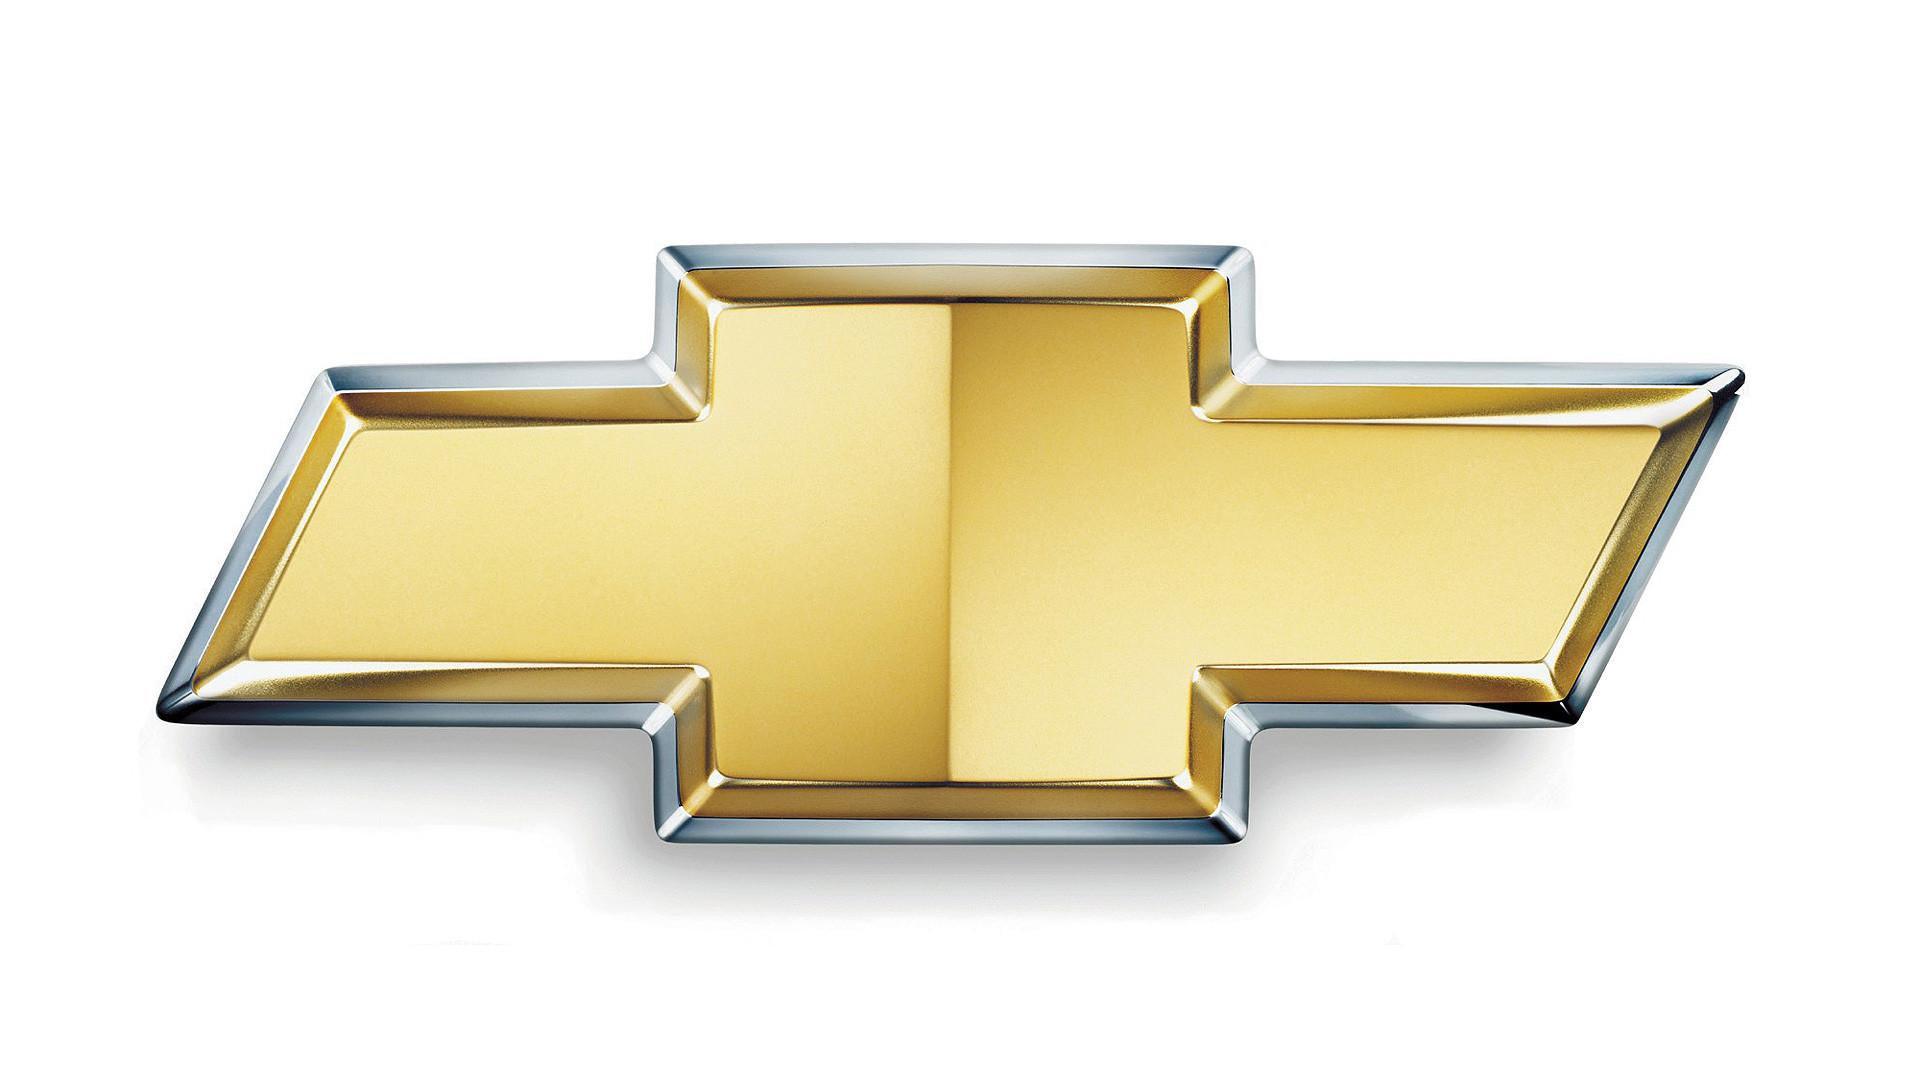 Res: 1921x1080, Chevrolet Logo (2004) 1920x1080